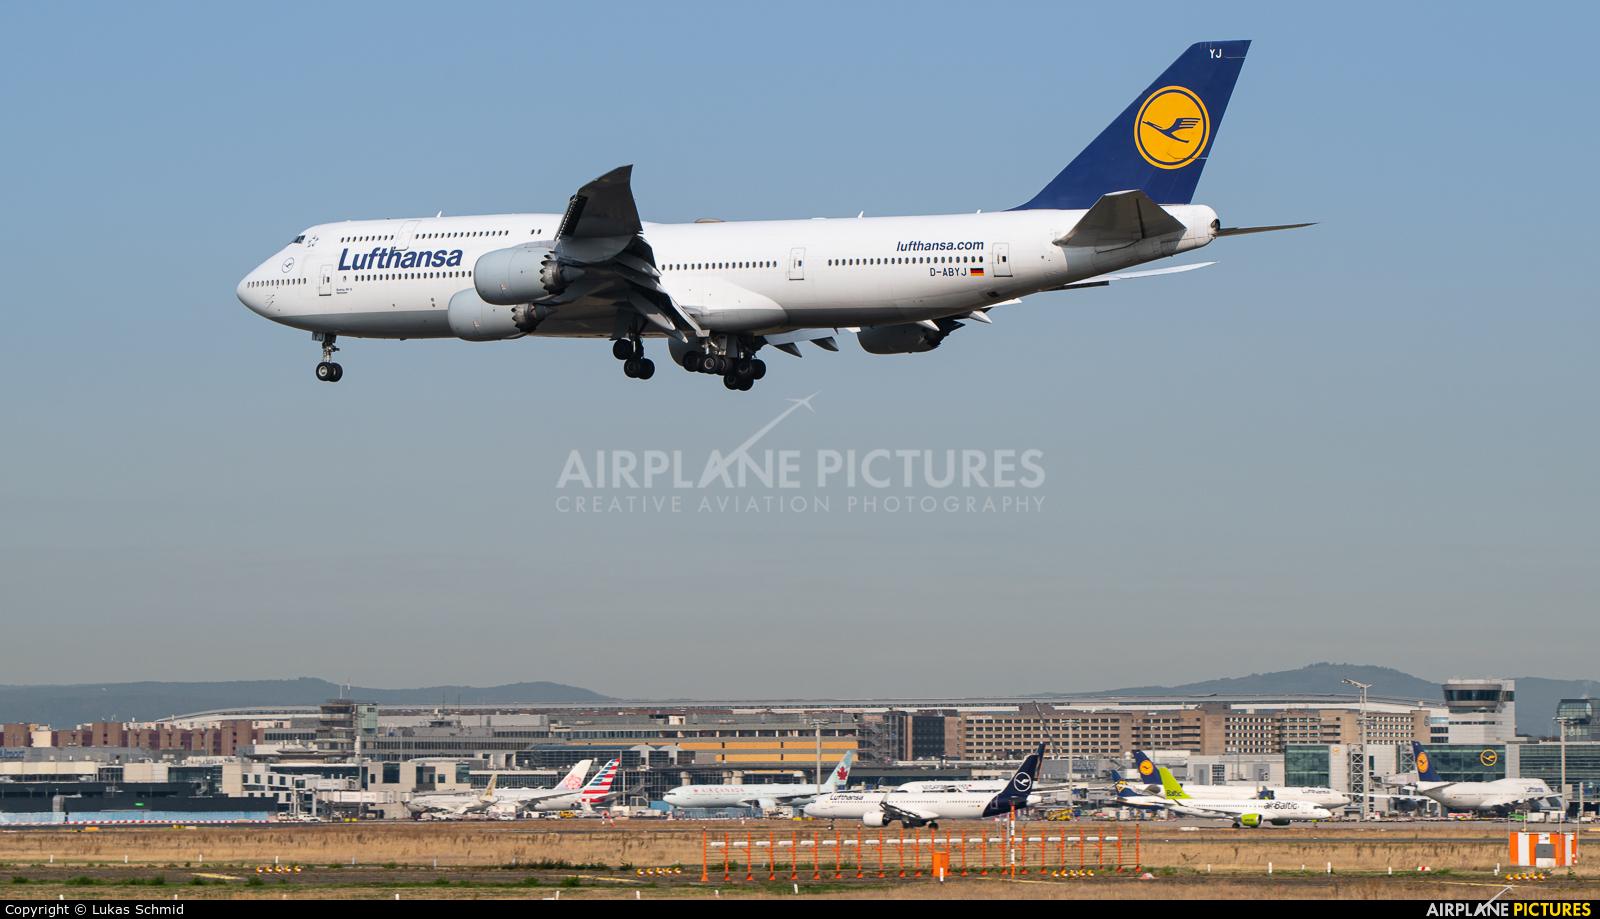 Lufthansa D-ABYJ aircraft at Frankfurt